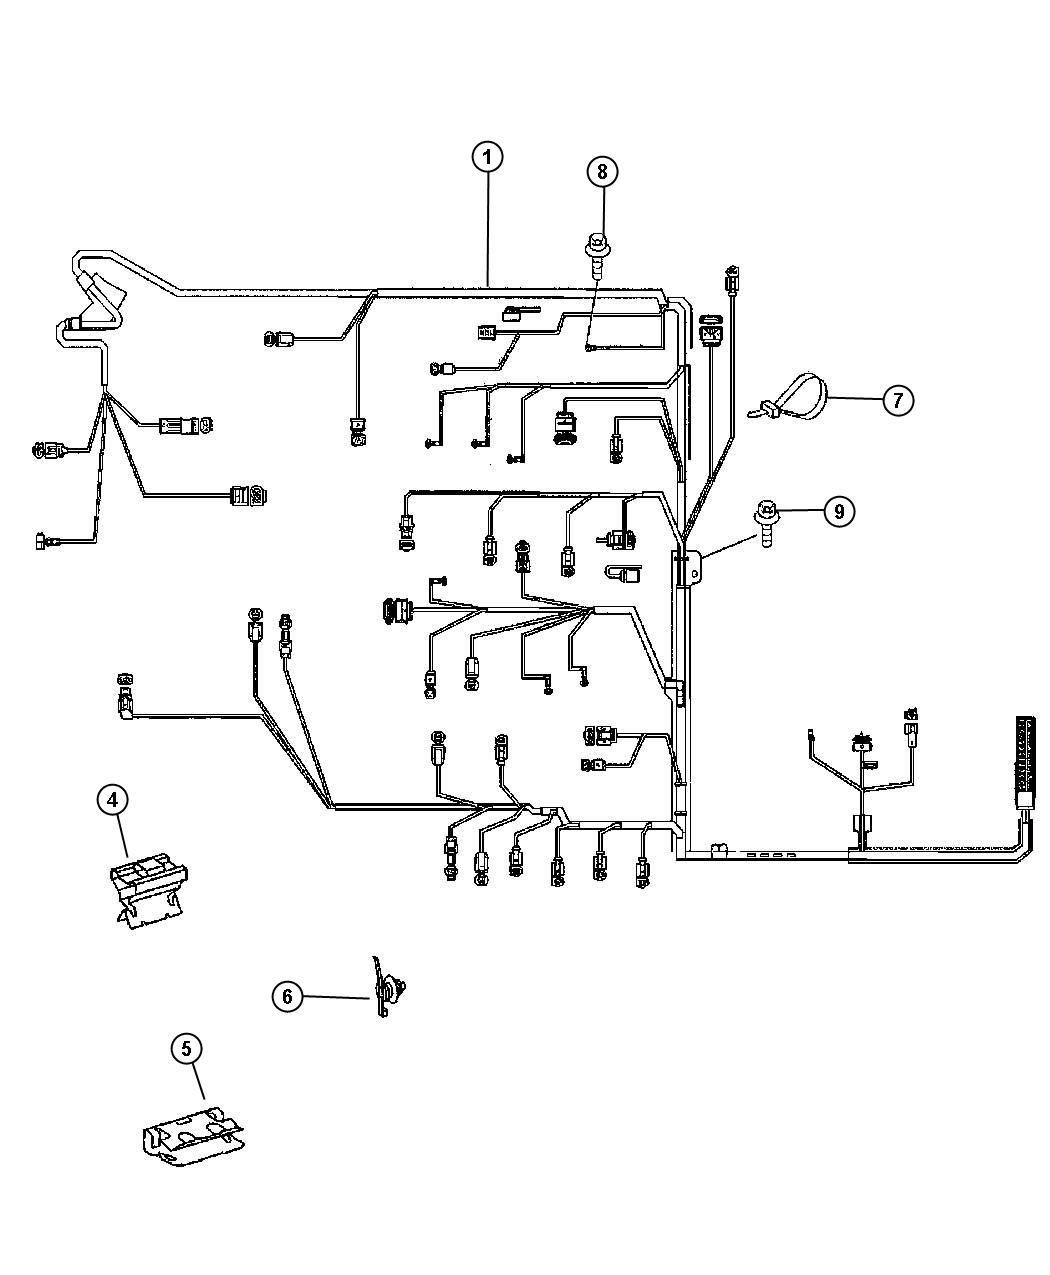 2007 Dodge Sprinter 2500 Wiring. Battery, alternator, amp